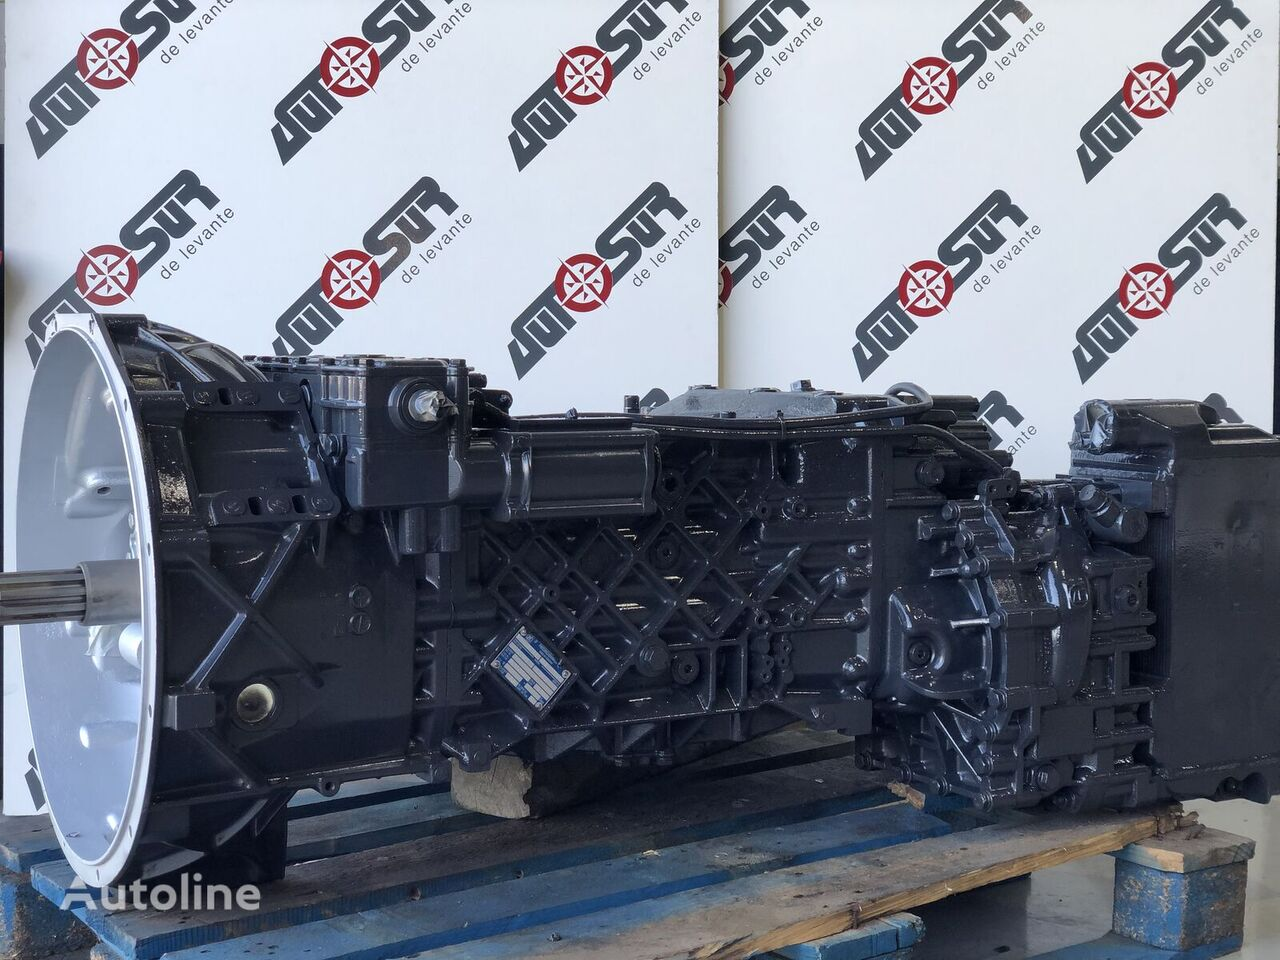 КПП ZF 16 S 2221 TO IT (41289526) для грузовика